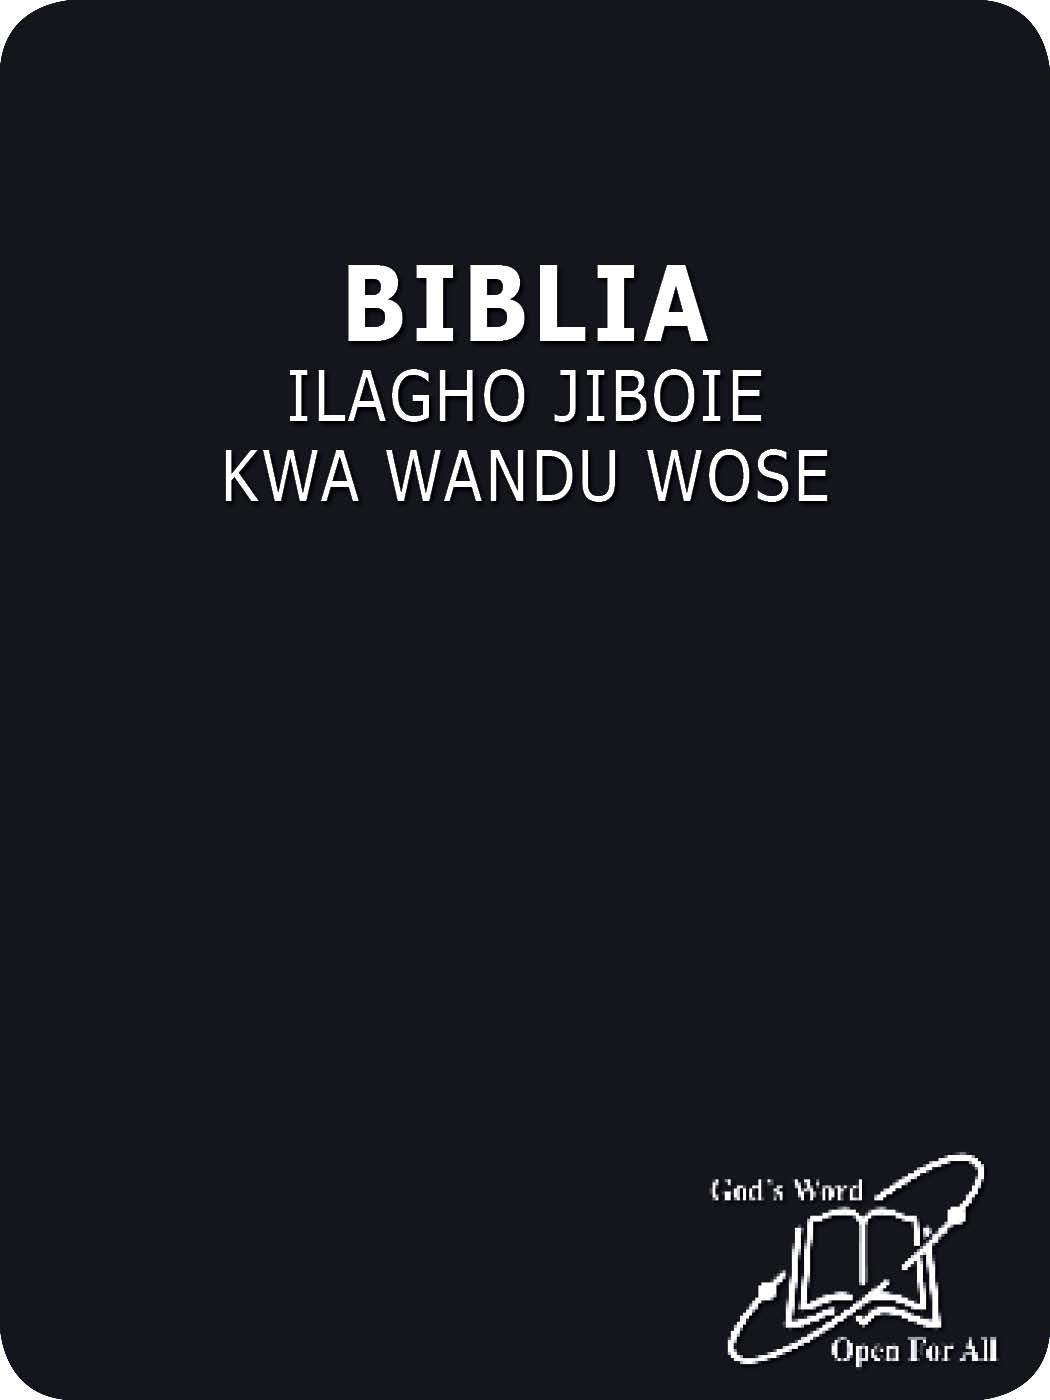 BIBLIA ILAGHO JIBOIE KWA WANDU WOSE